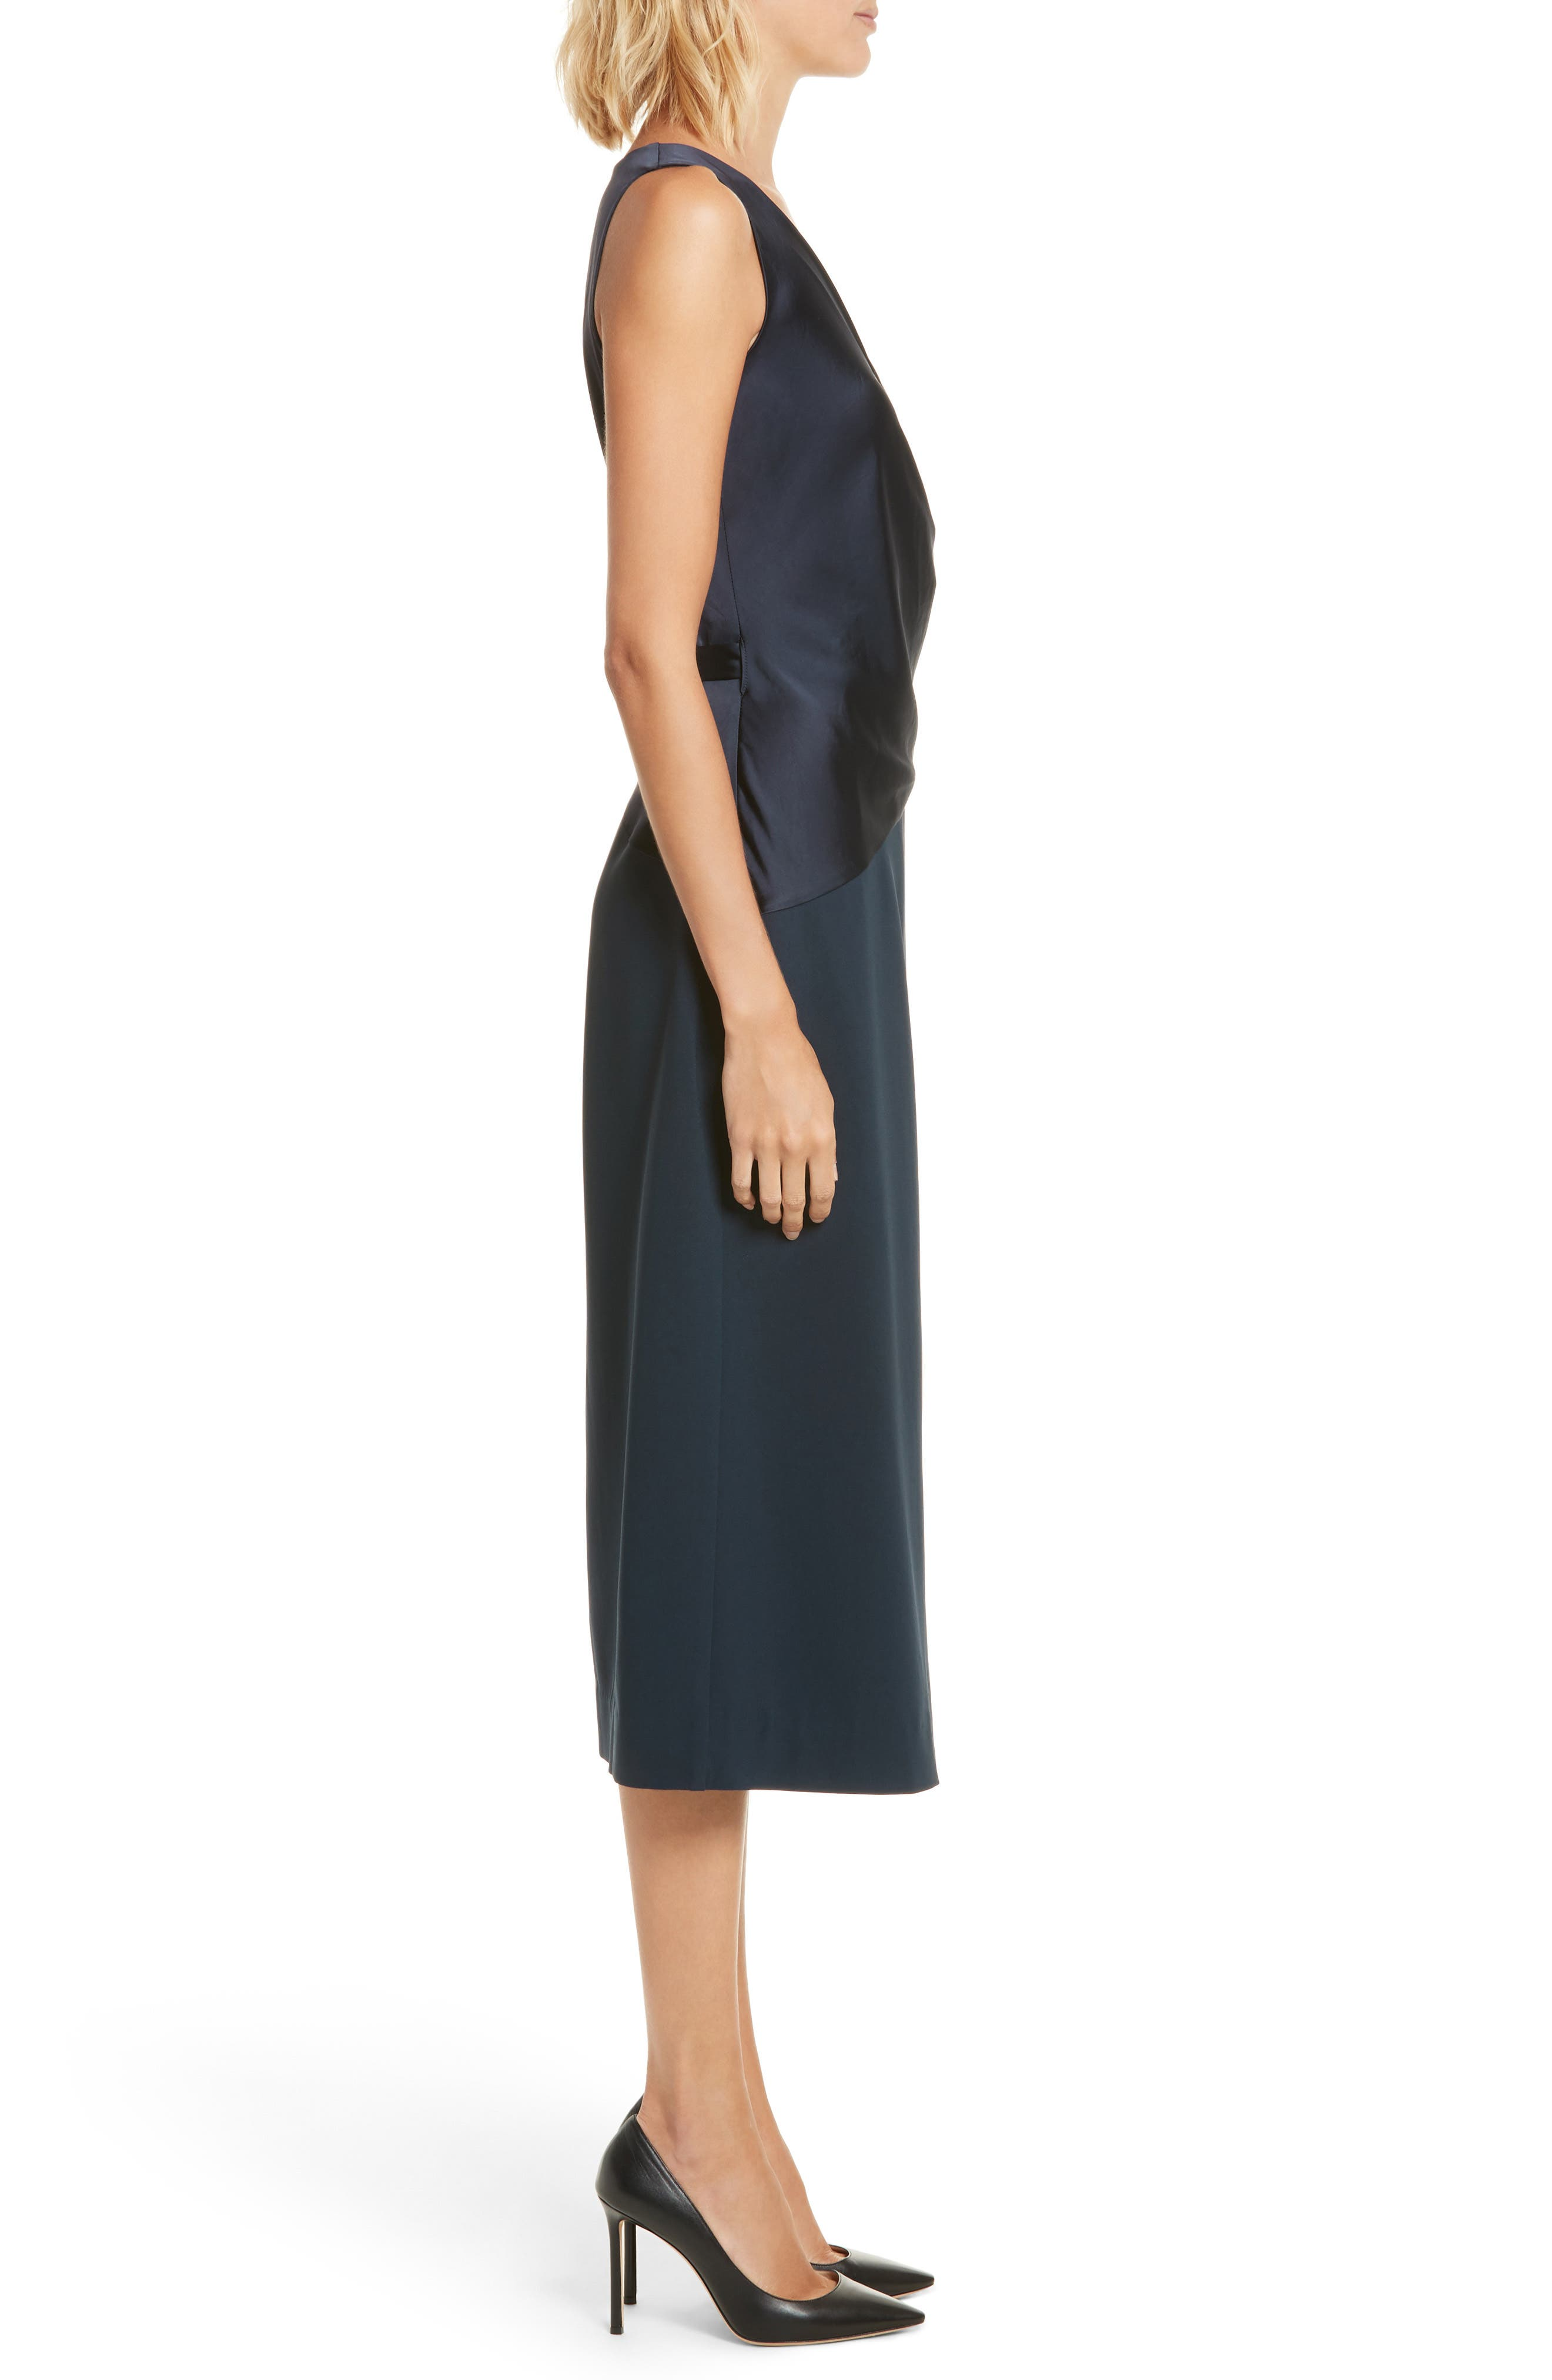 Midi Wrap Dress,                             Alternate thumbnail 3, color,                             Alexander Navy/ Black